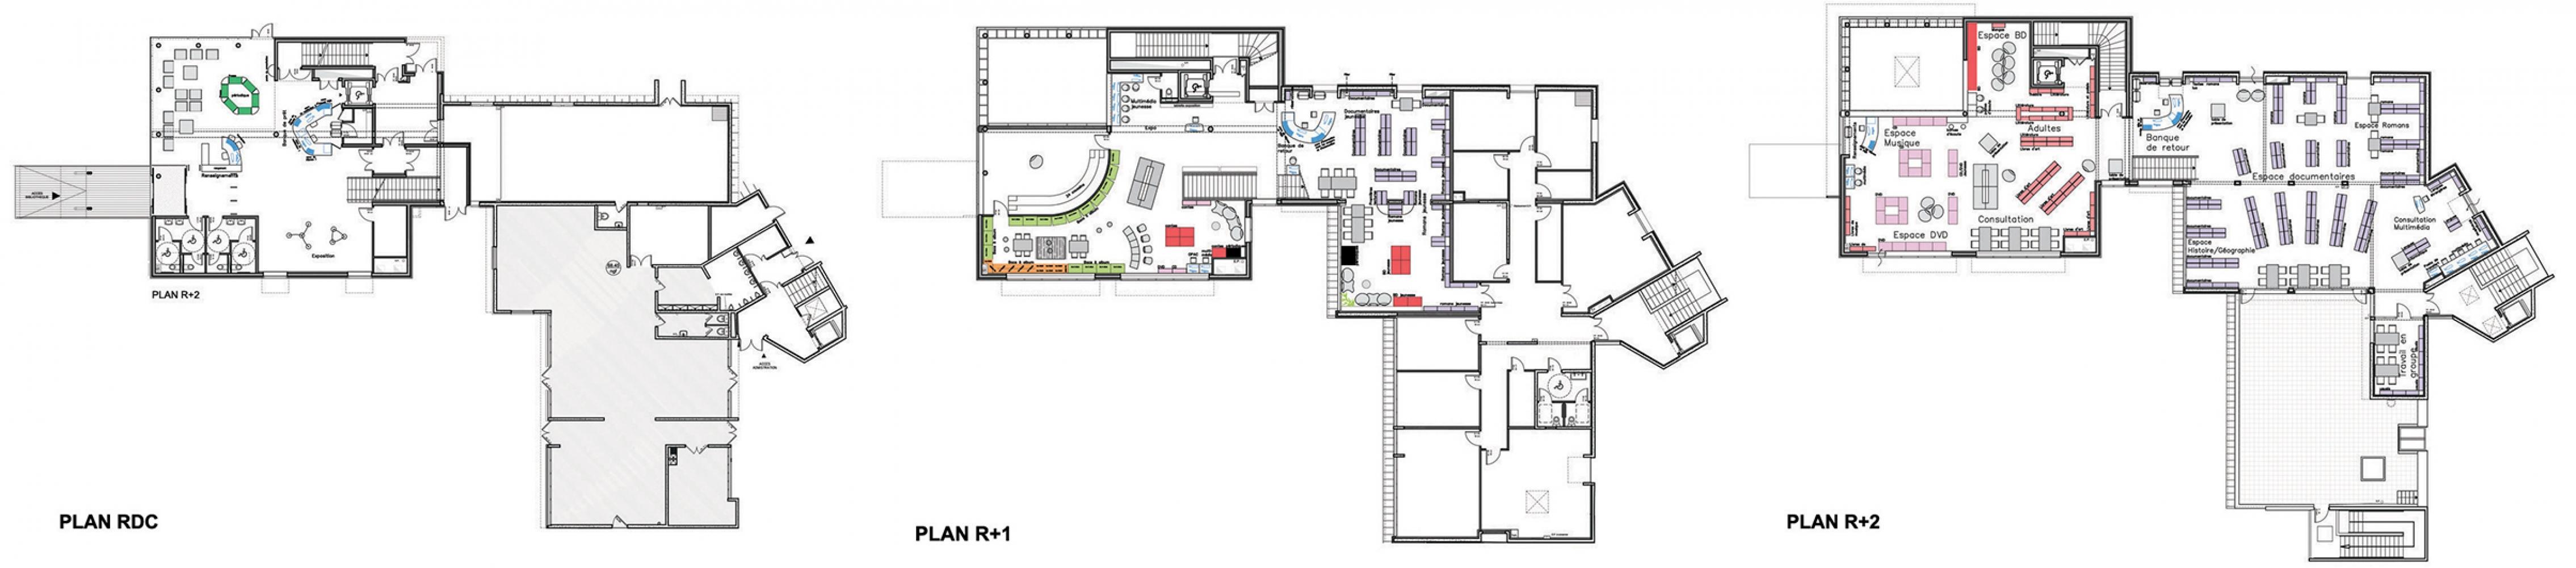 plan_massy Pascale SEURIN Architecte - Pascale SEURIN Architecte